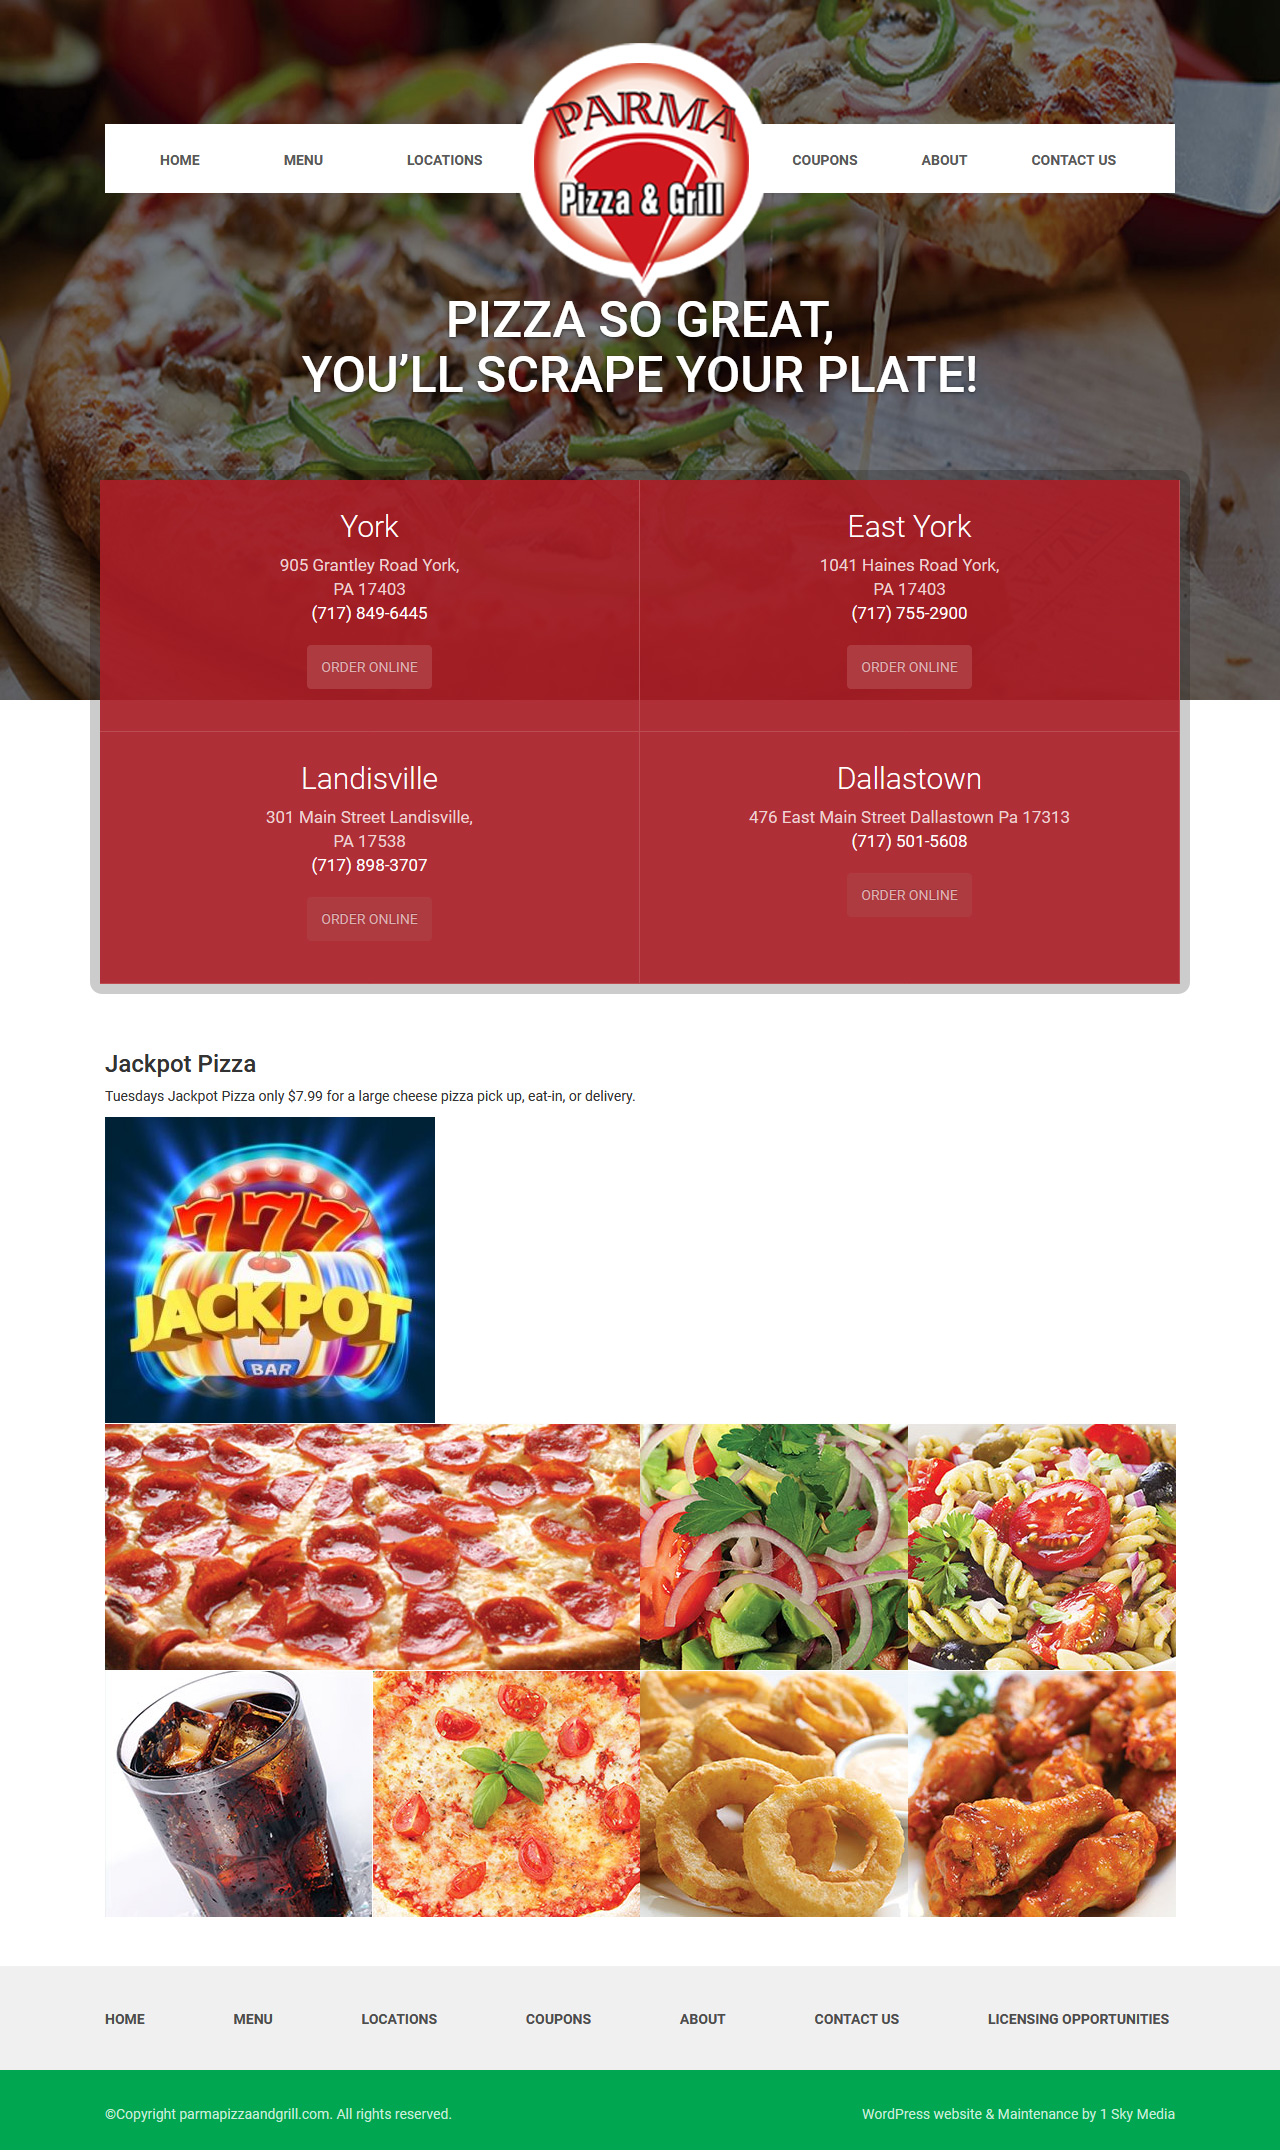 Parma Pizza & Grill pizzeria website design